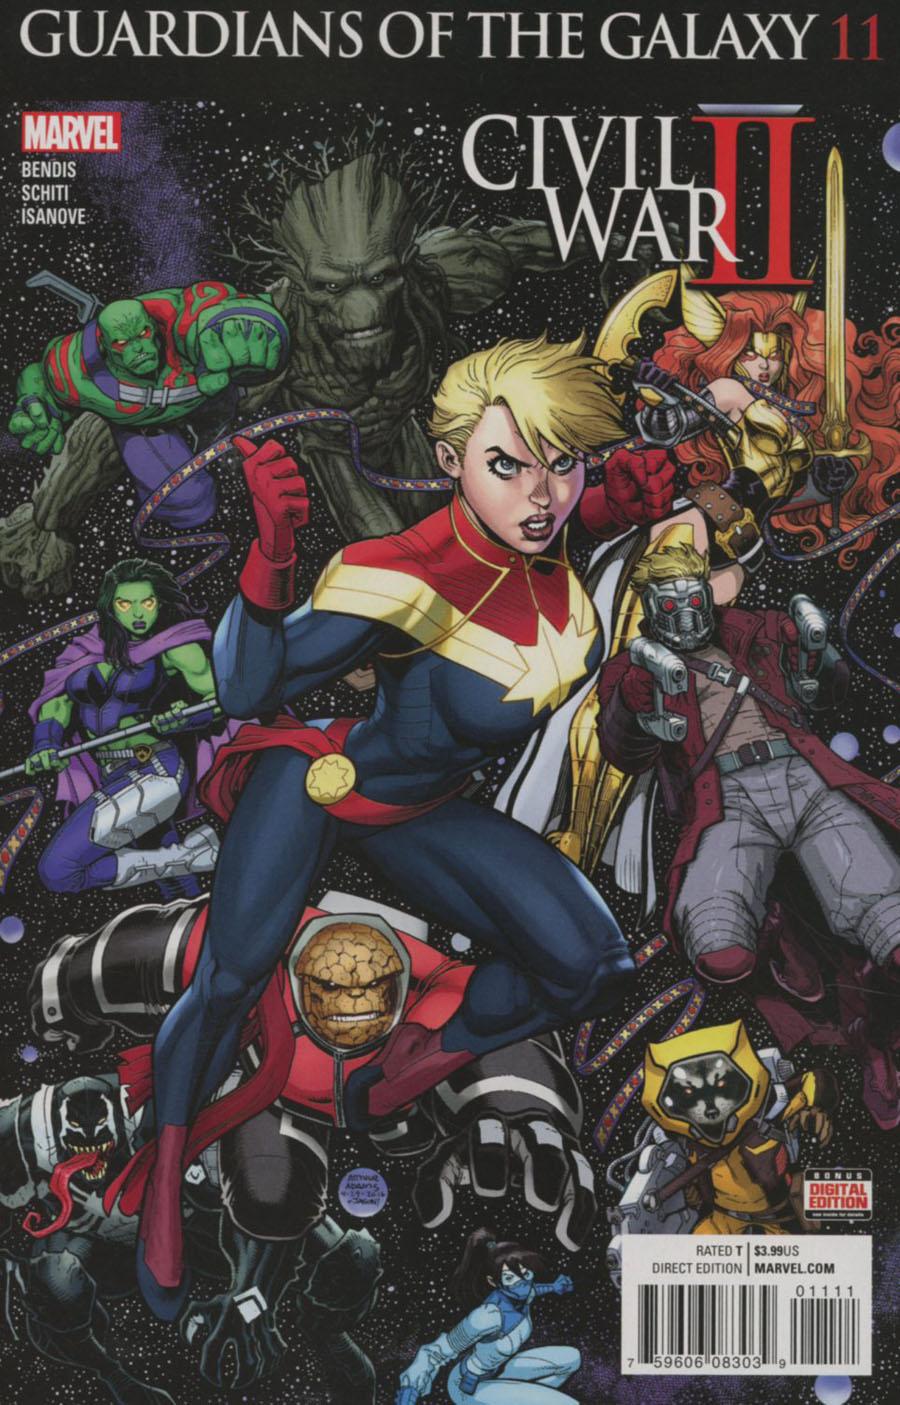 Guardians Of The Galaxy Vol 4 #11 Cover A Regular Arthur Adams Cover (Civil War II Tie-In)